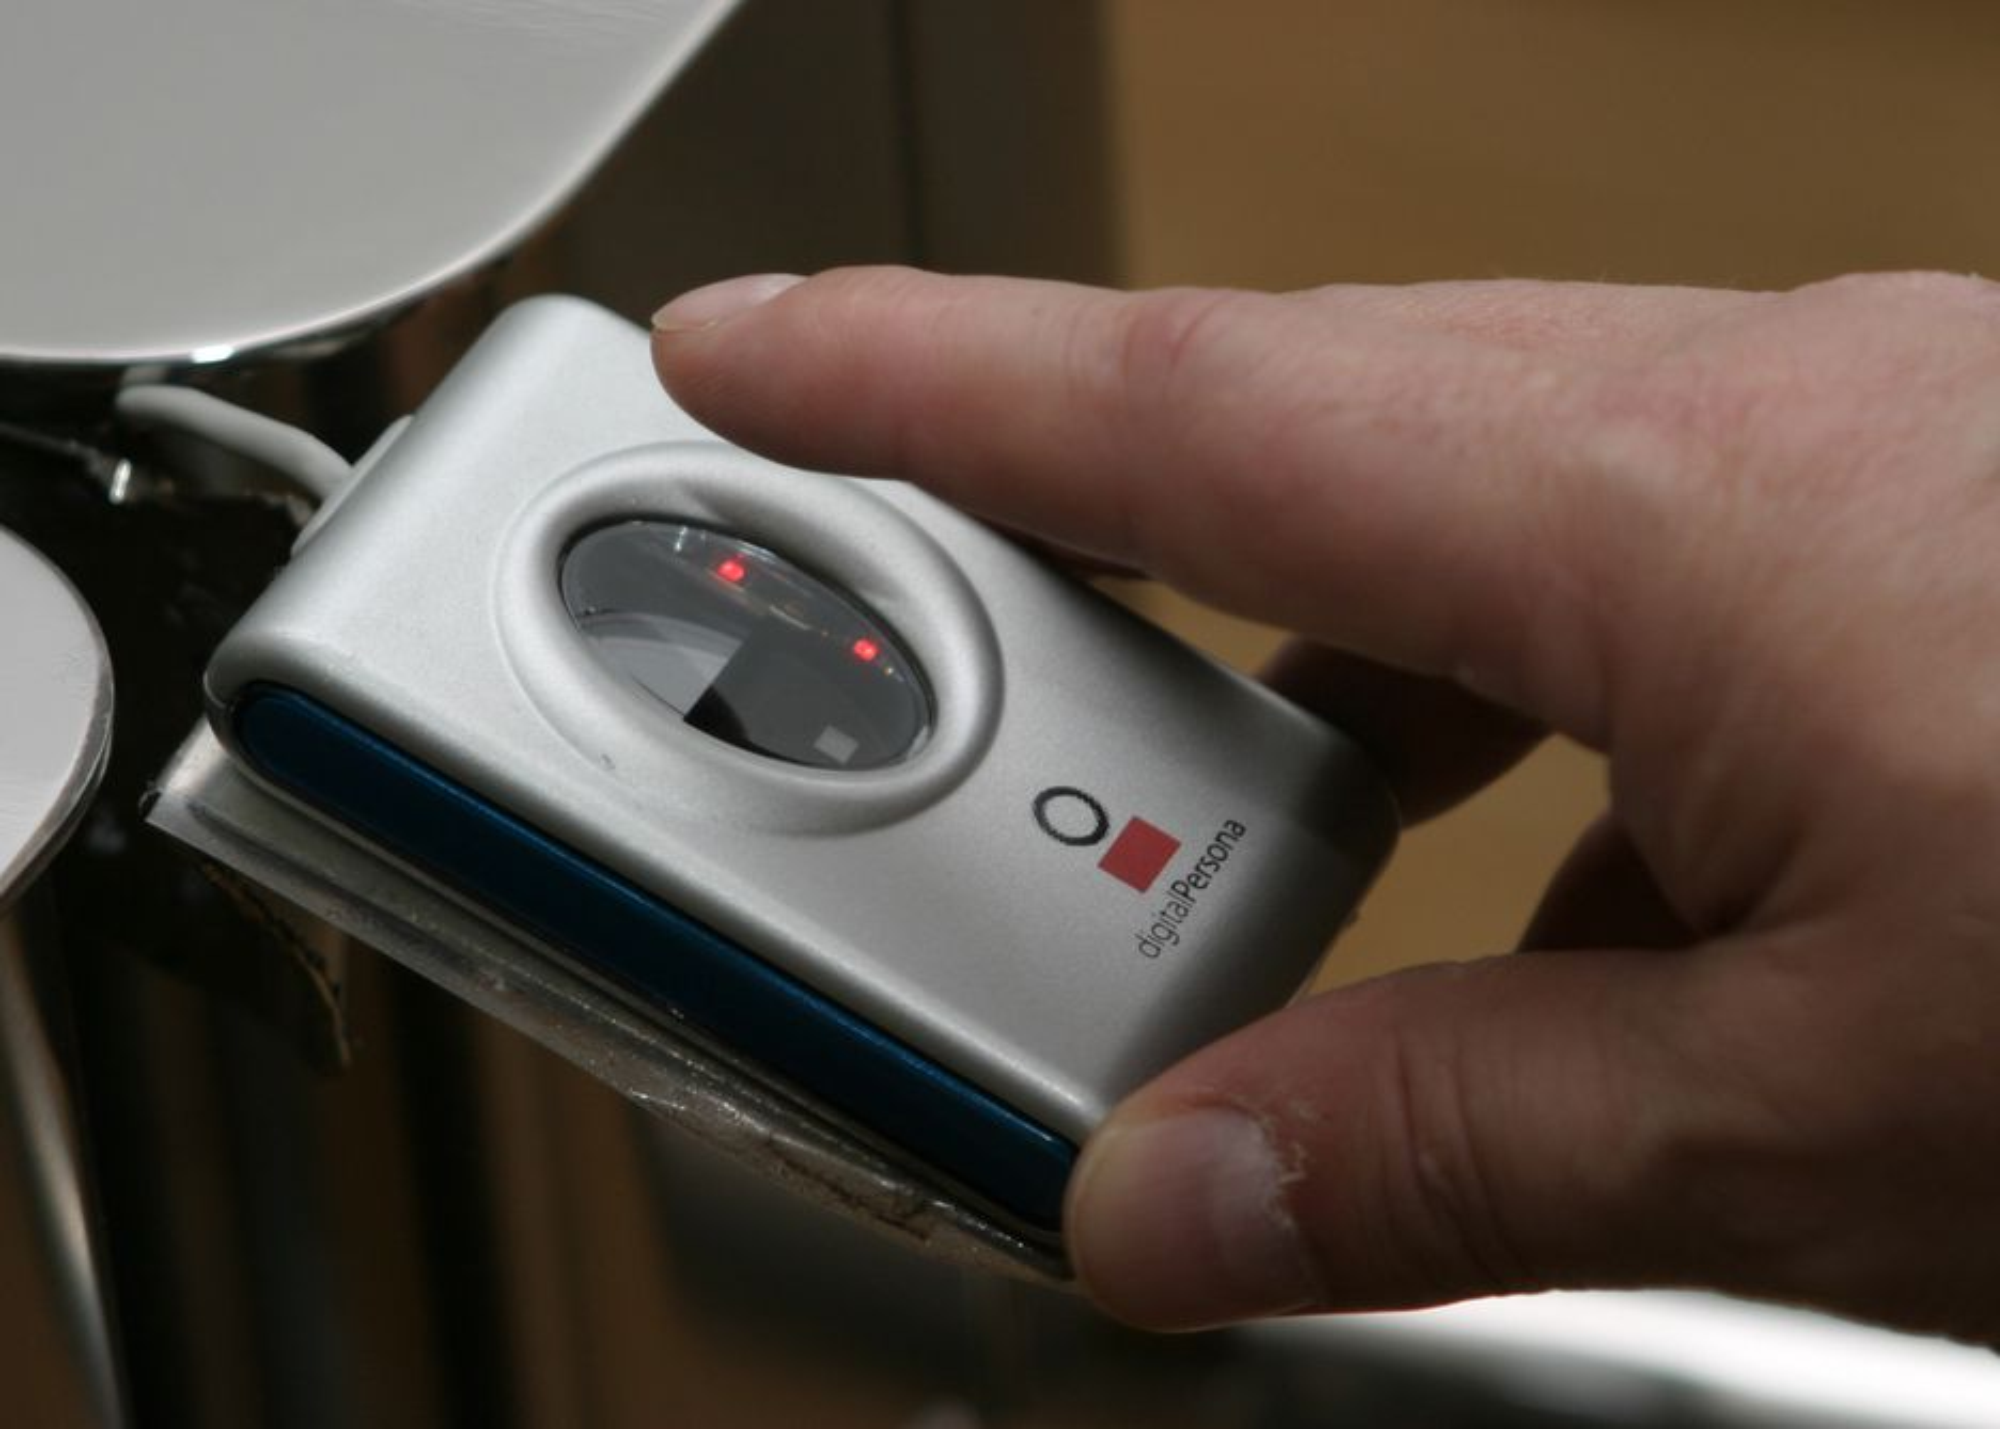 biometri, fingeravtrykk, adgangskontroll, biometrisk